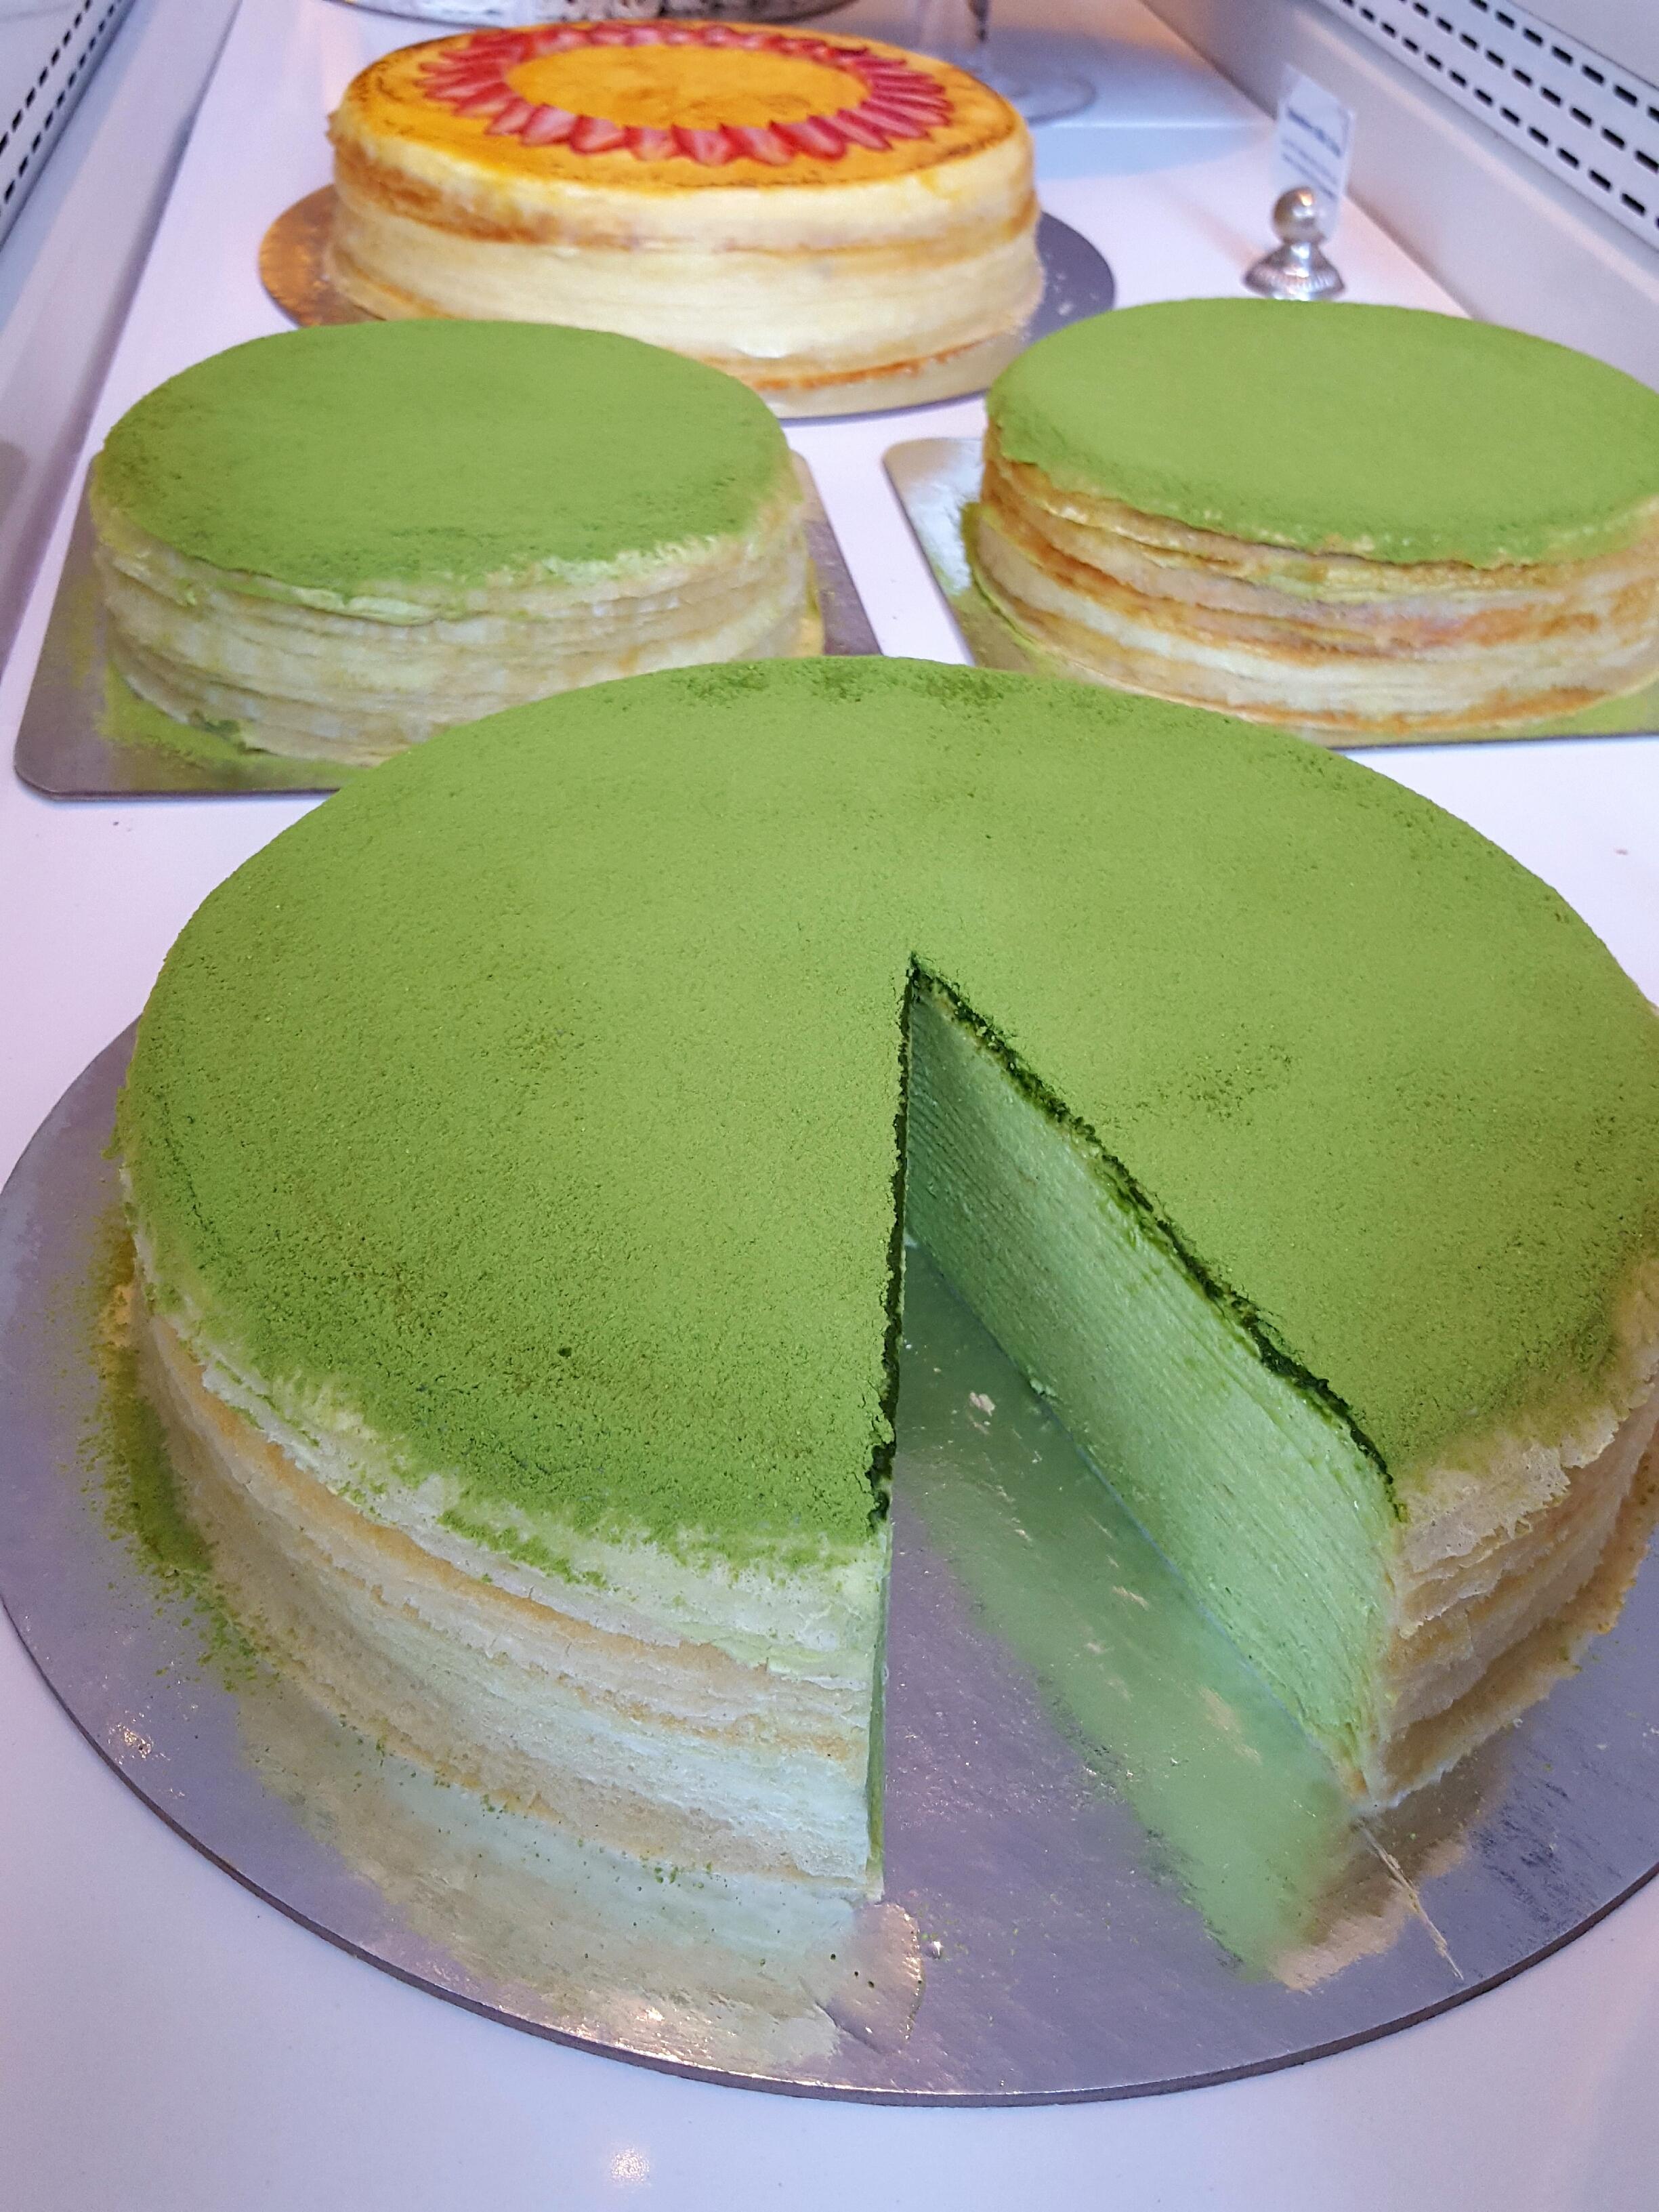 Lady M dessert cakes